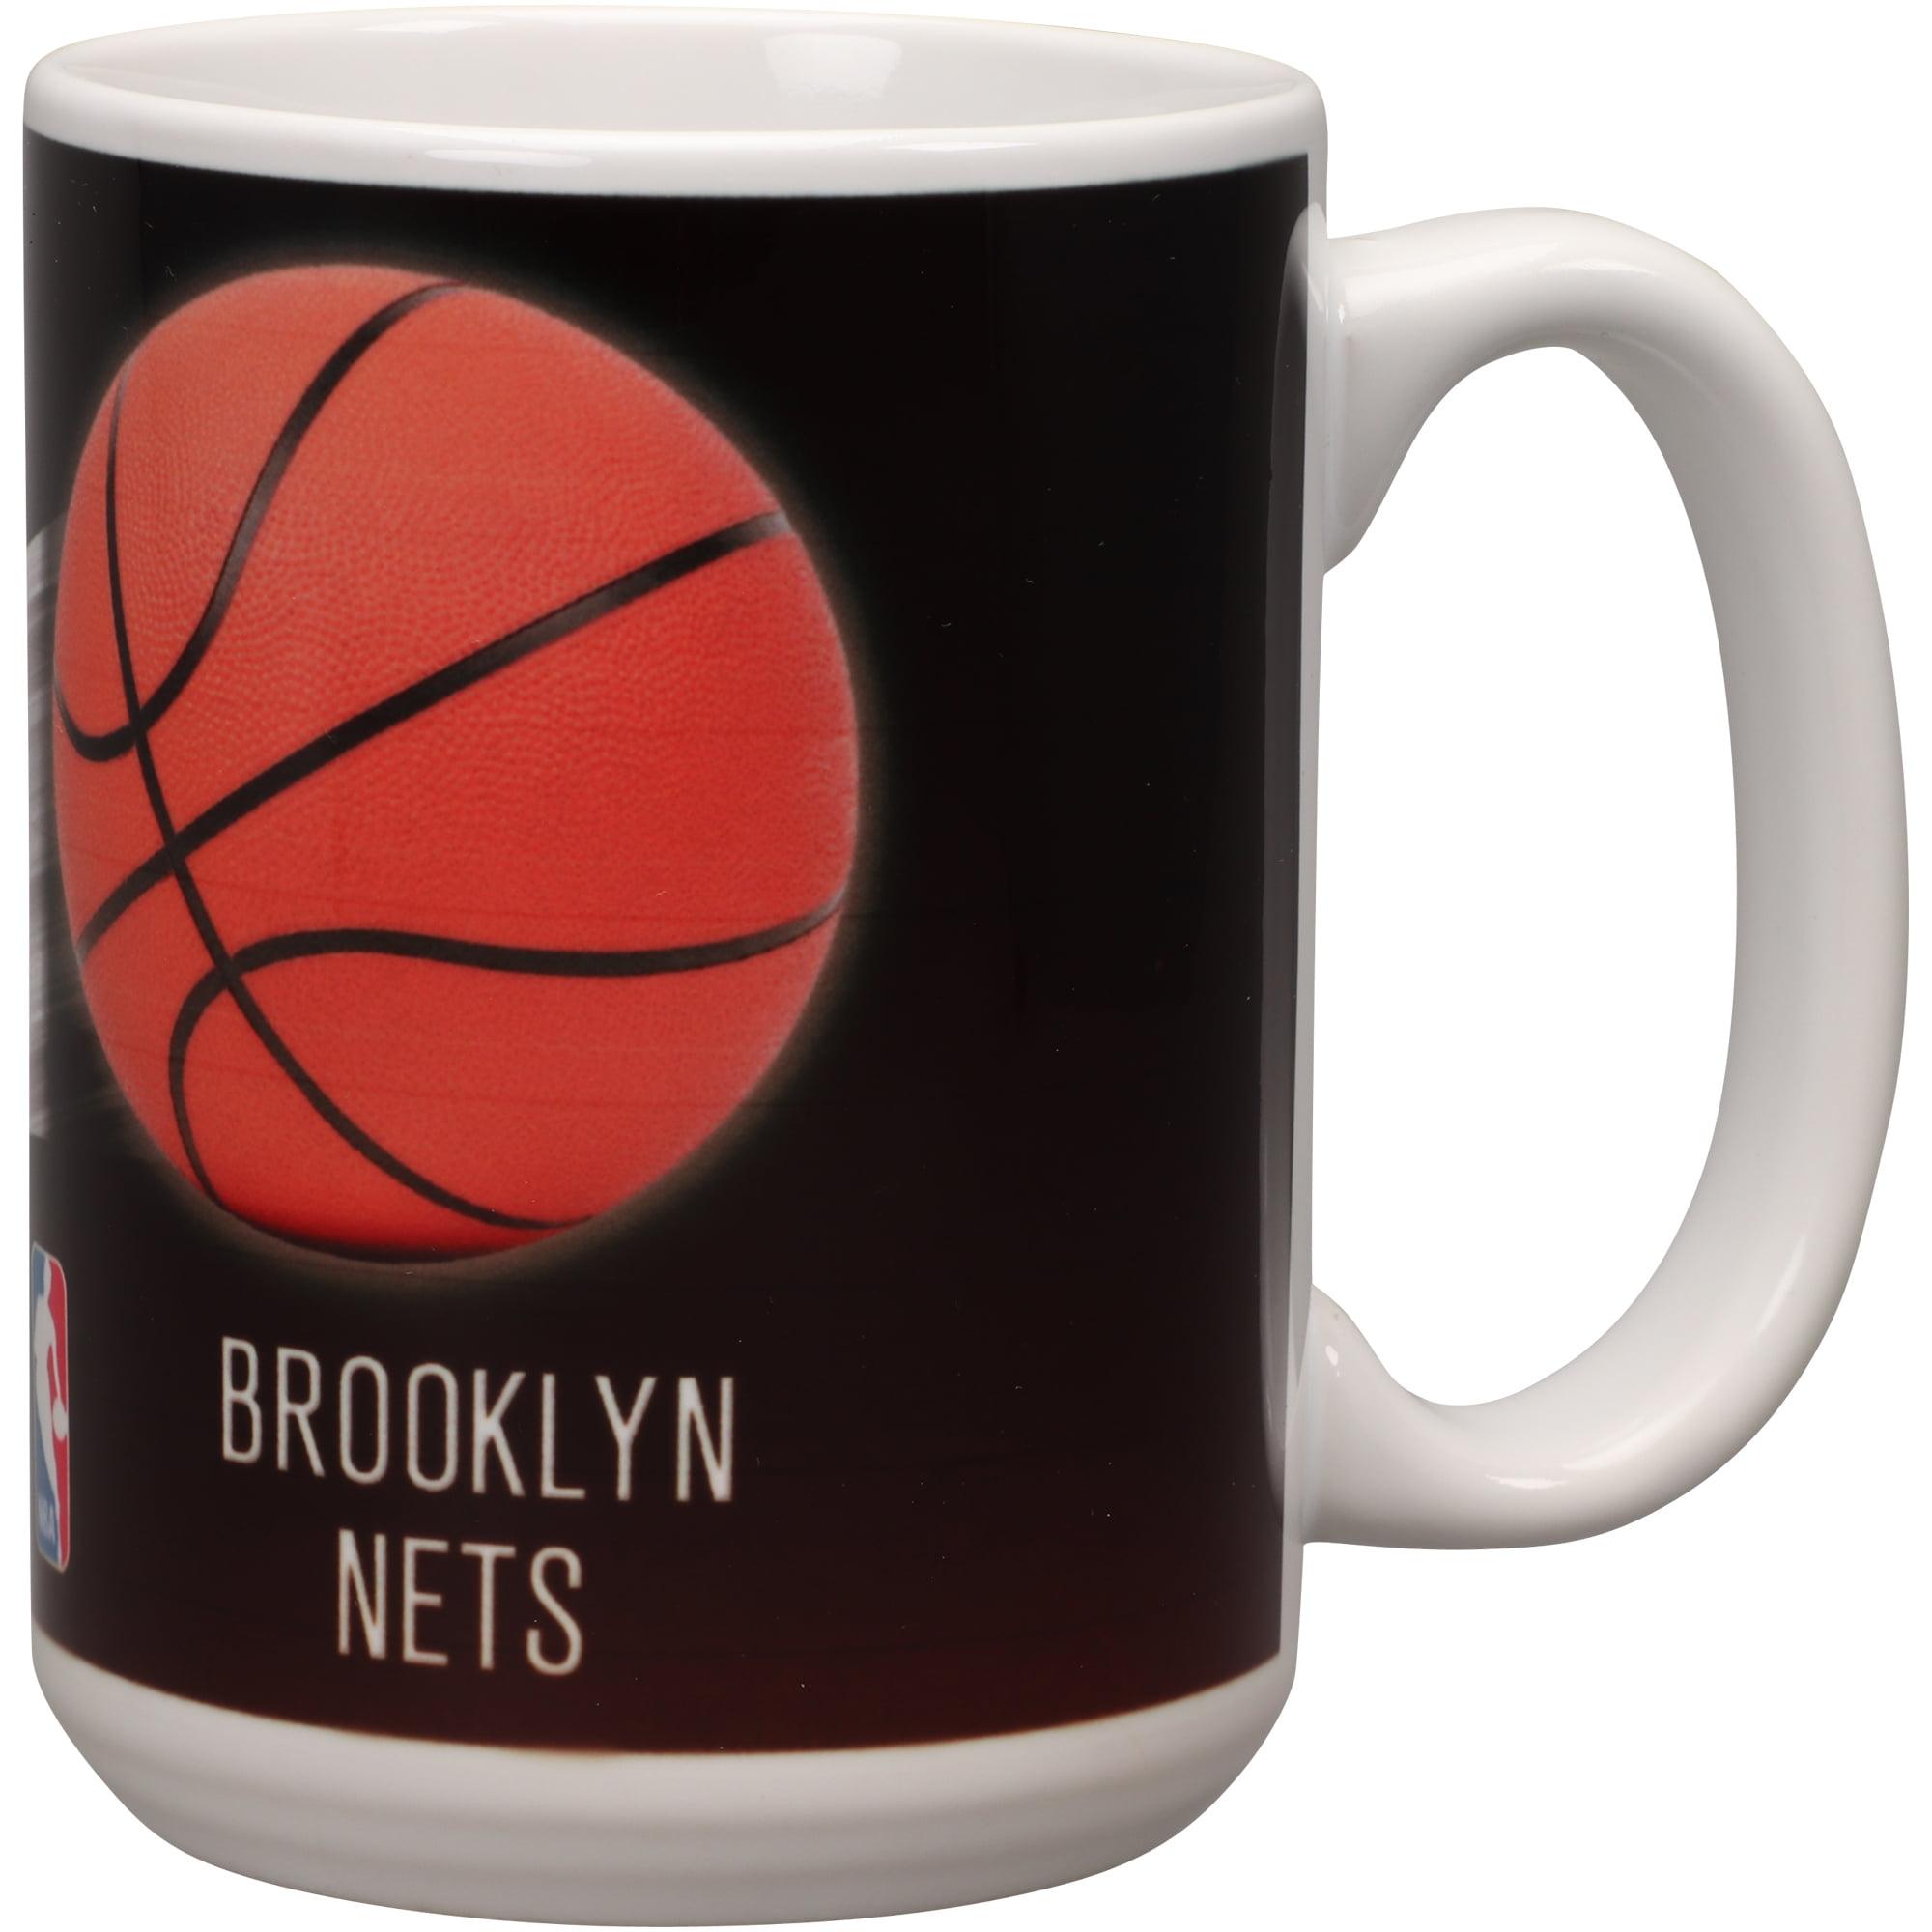 Brooklyn Nets 15oz. Team 3D Graphic Mug - No Size